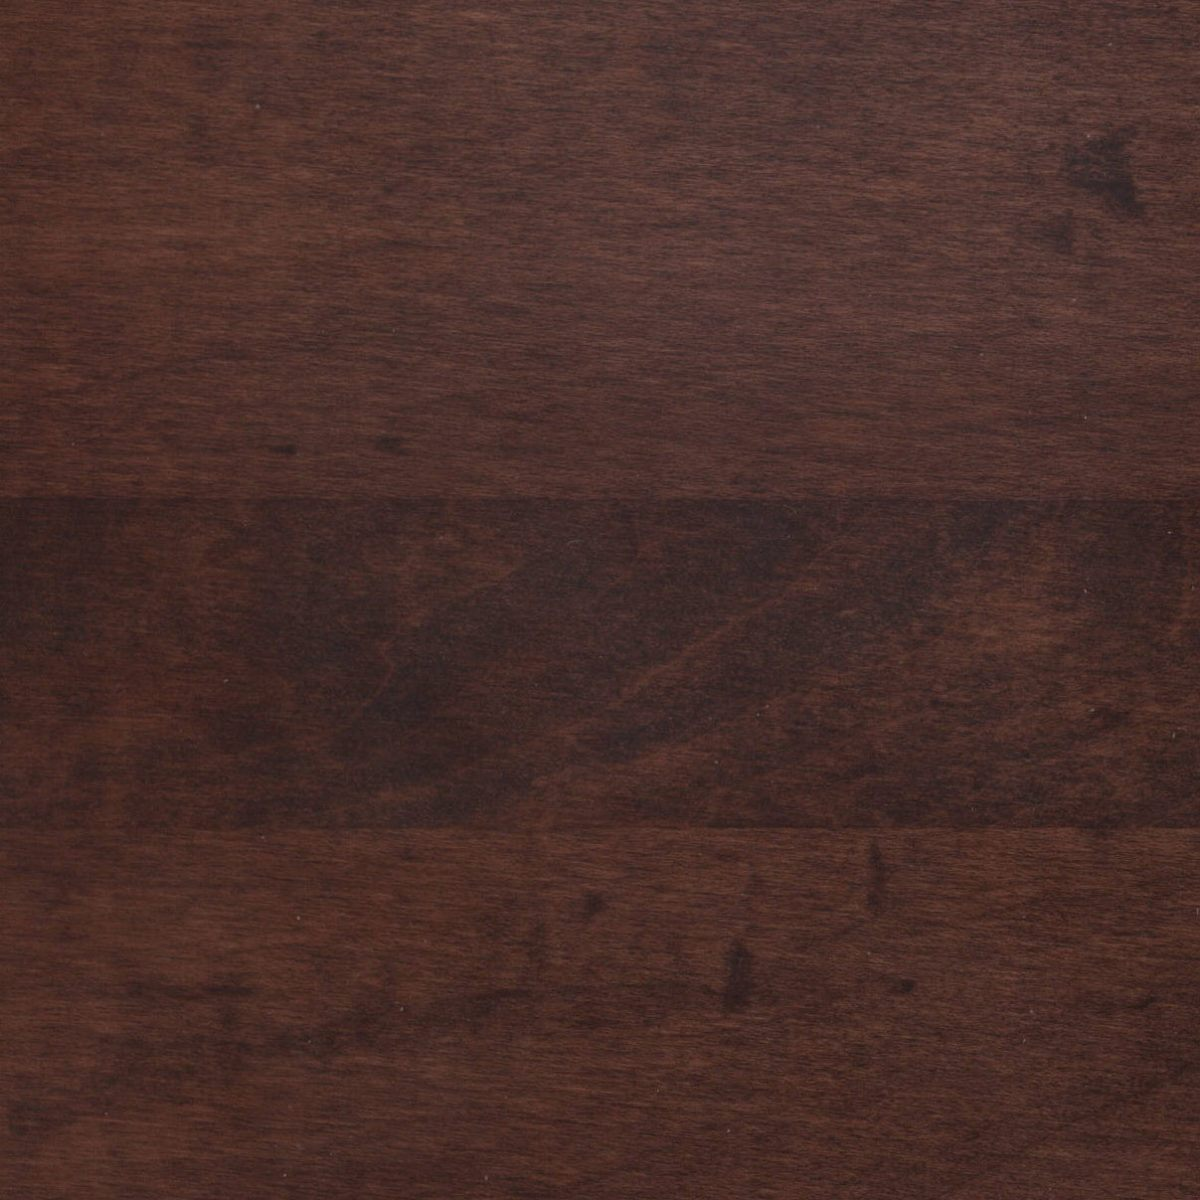 59B Dark Copper Maple Wood Sample